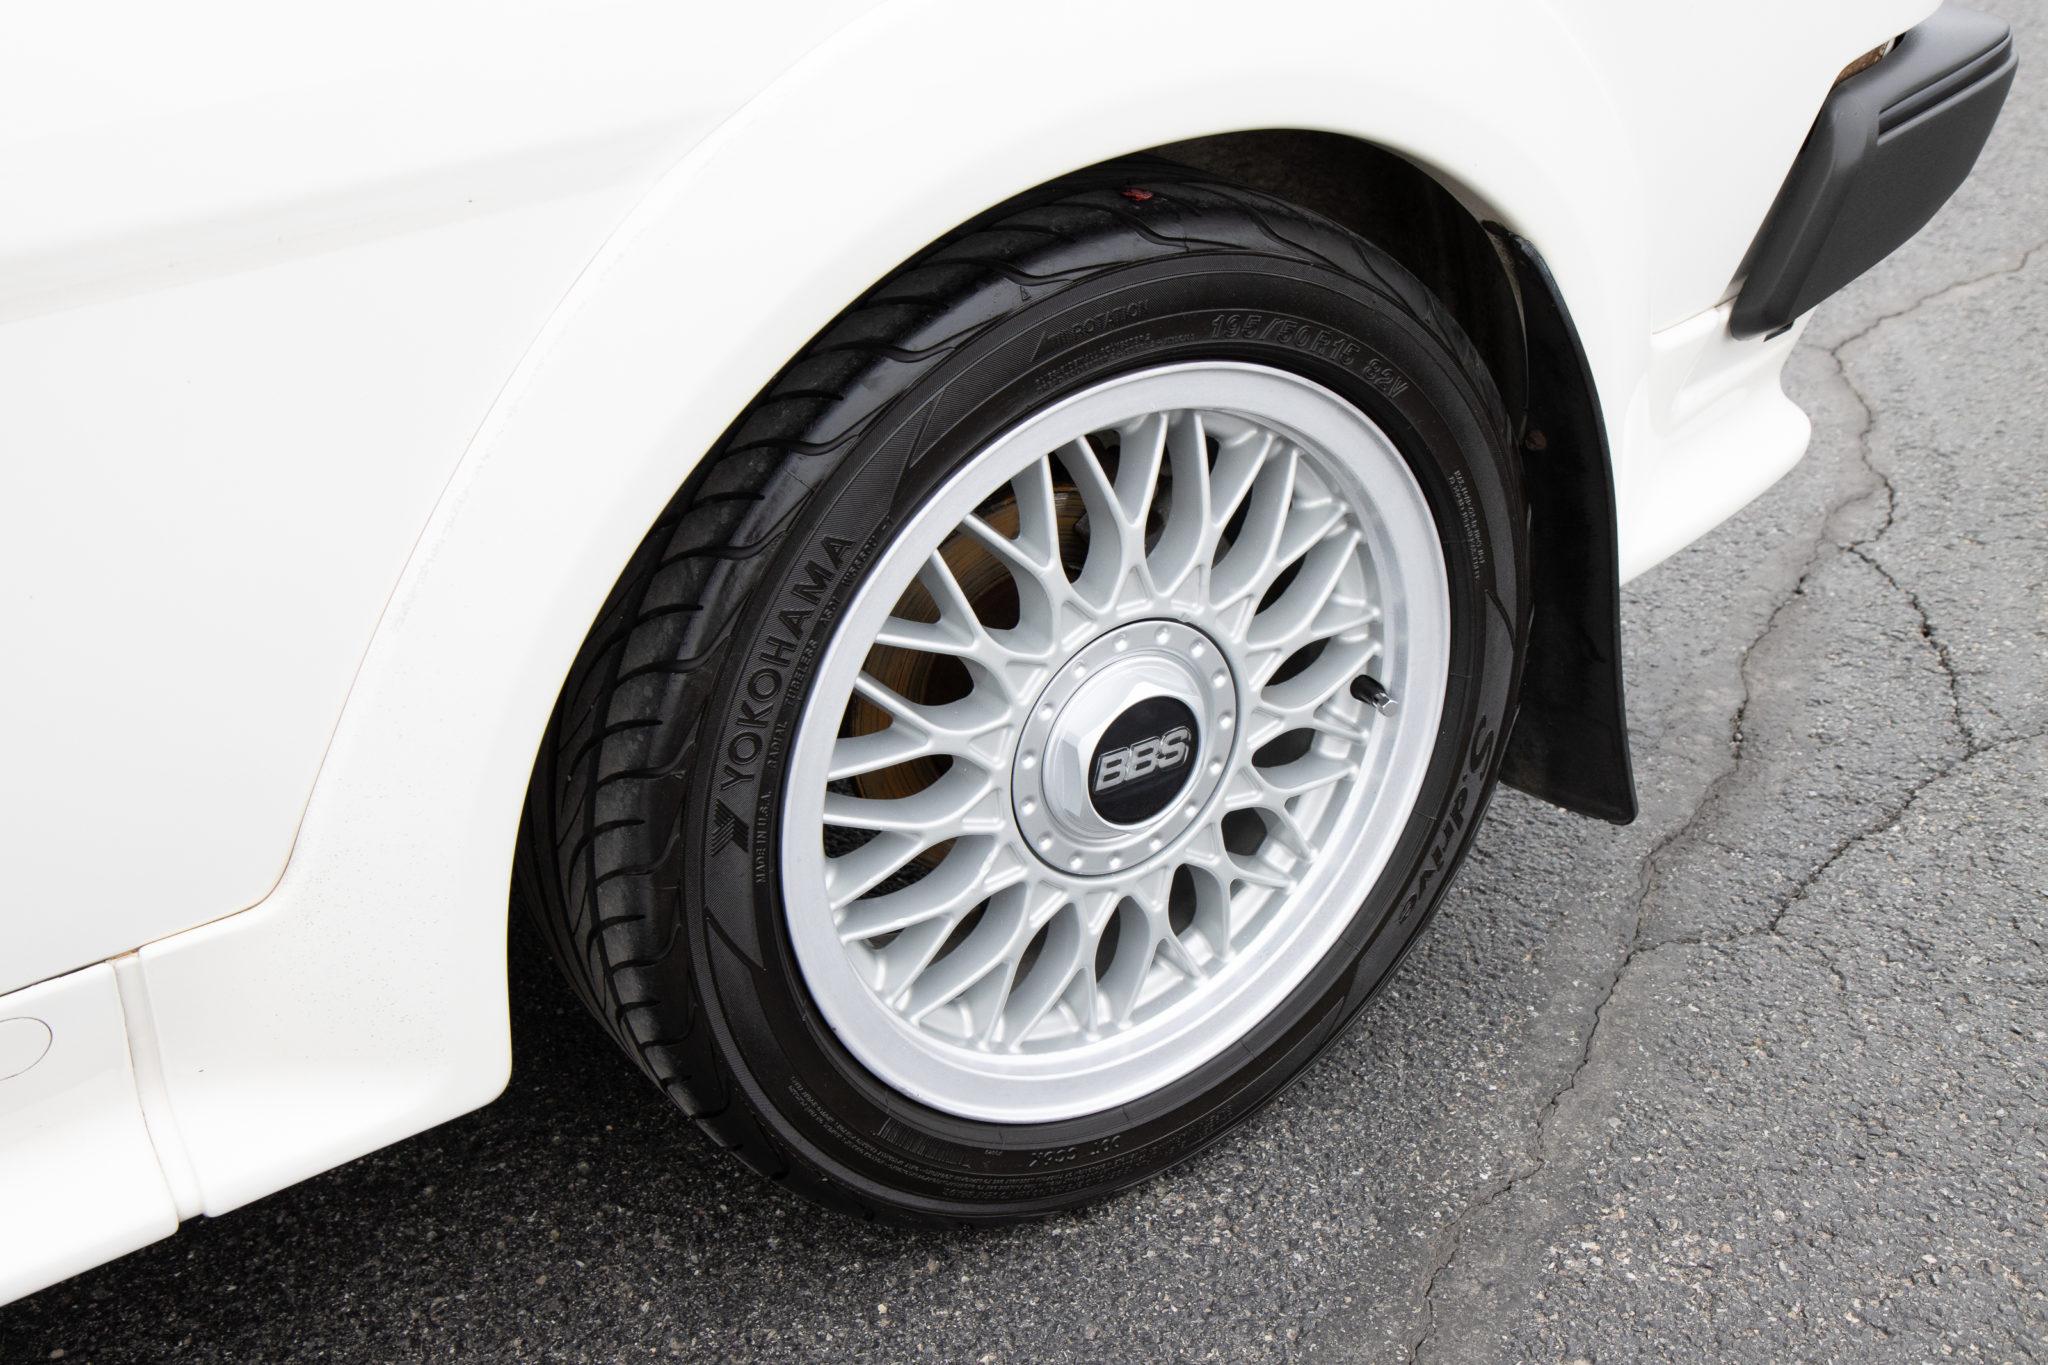 1988_volkswagen_scirocco_16v_1589486490b62d915Copy-of-VW-Scirocco-BaT-0030-scaled